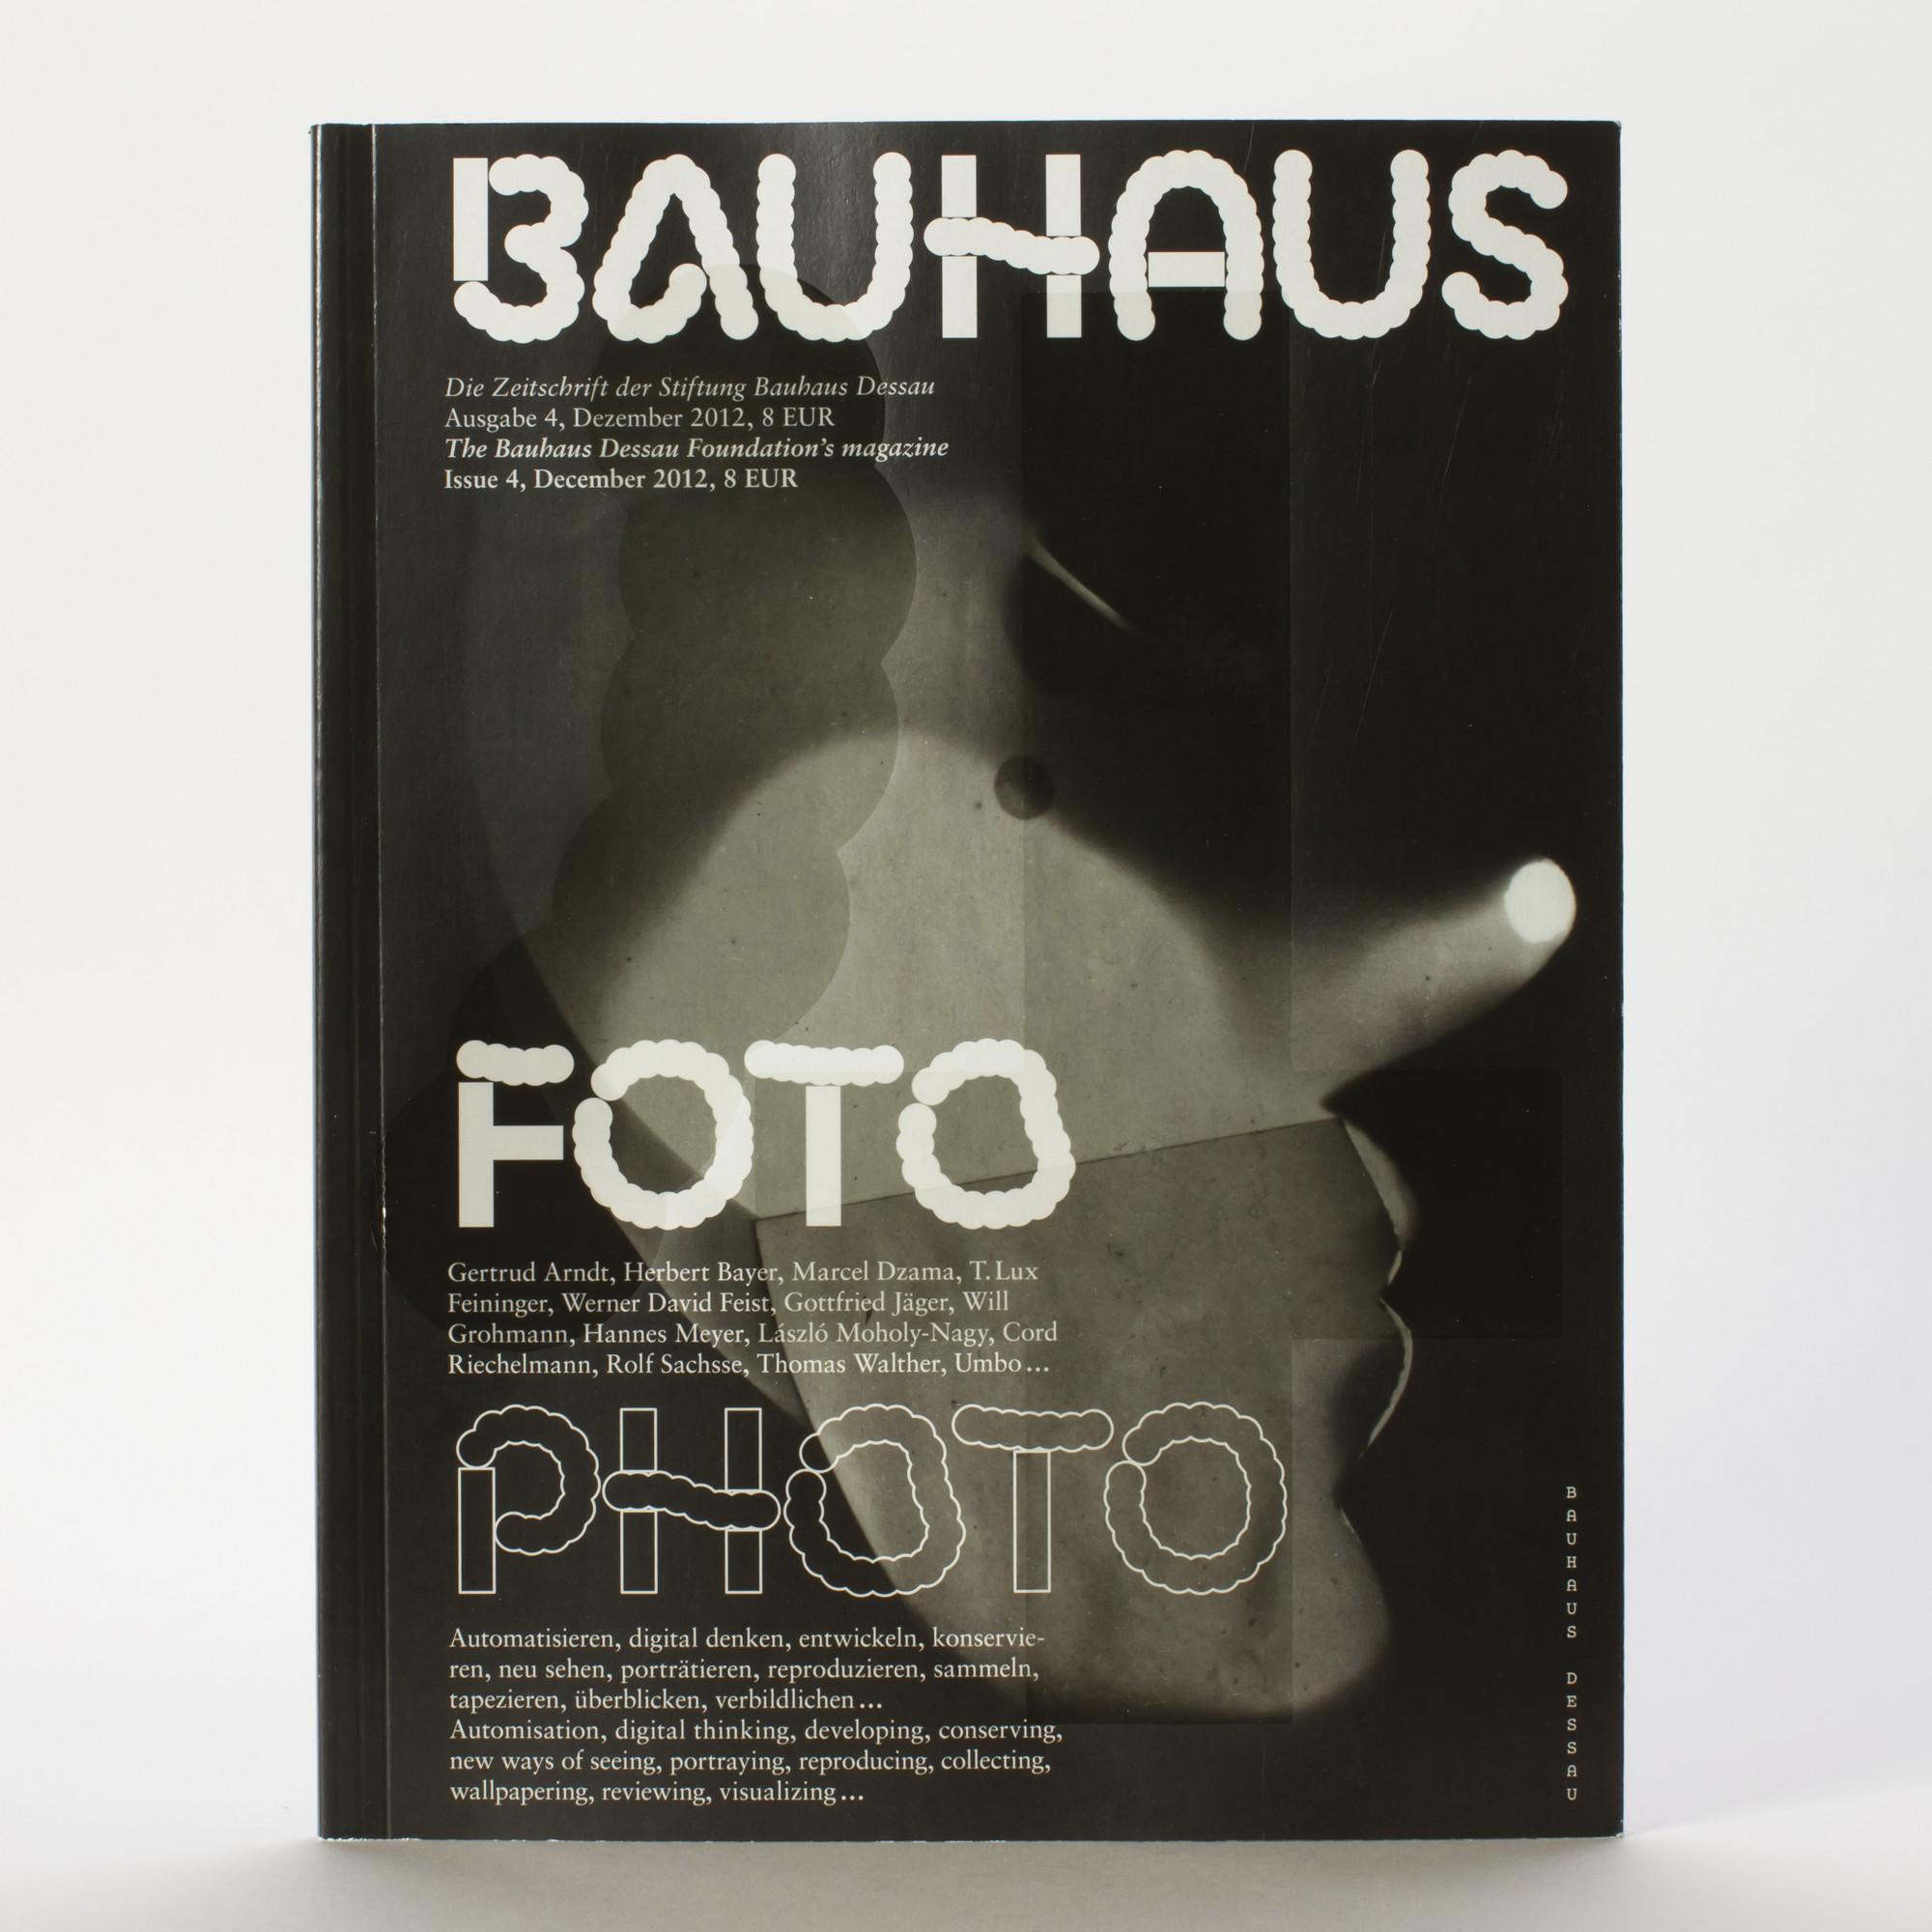 FOTO . Bauhaus Zeitschrift Nr. 4 | ZEITSCHRIFTEN | BUCH | BAUHAUS ...